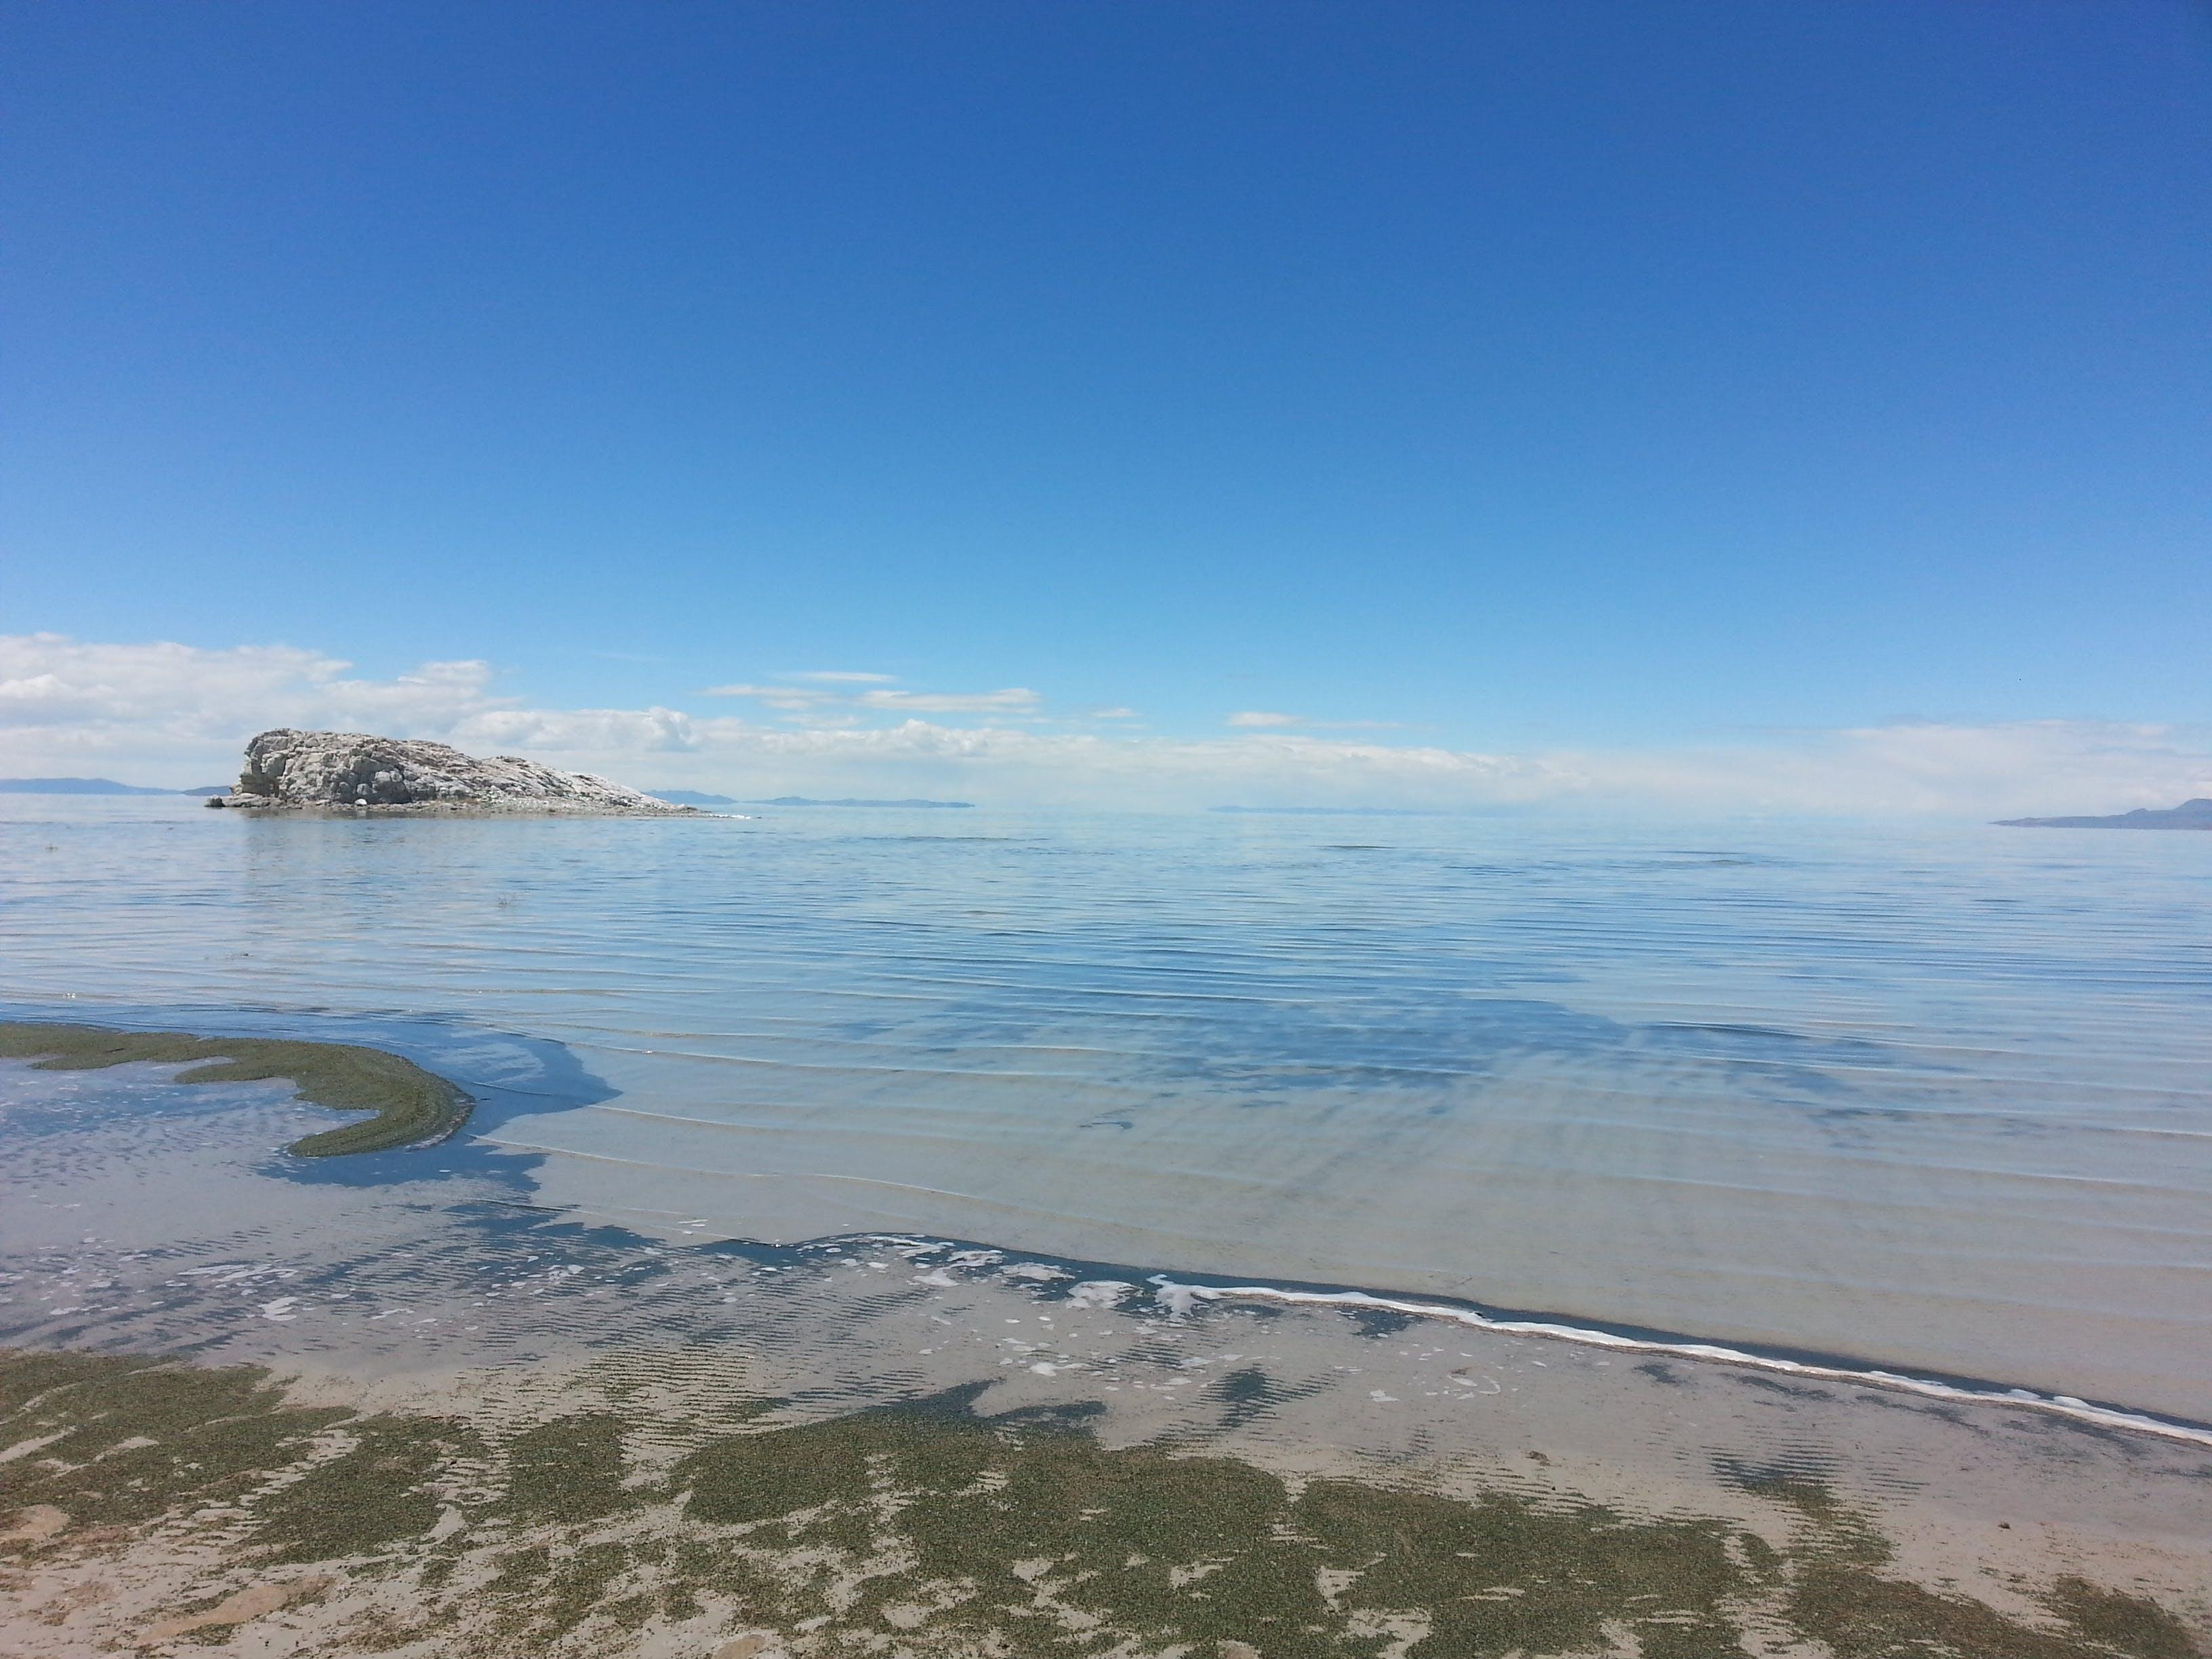 Fotos de stock gratuitas de agua, arena, costa, dice adiós